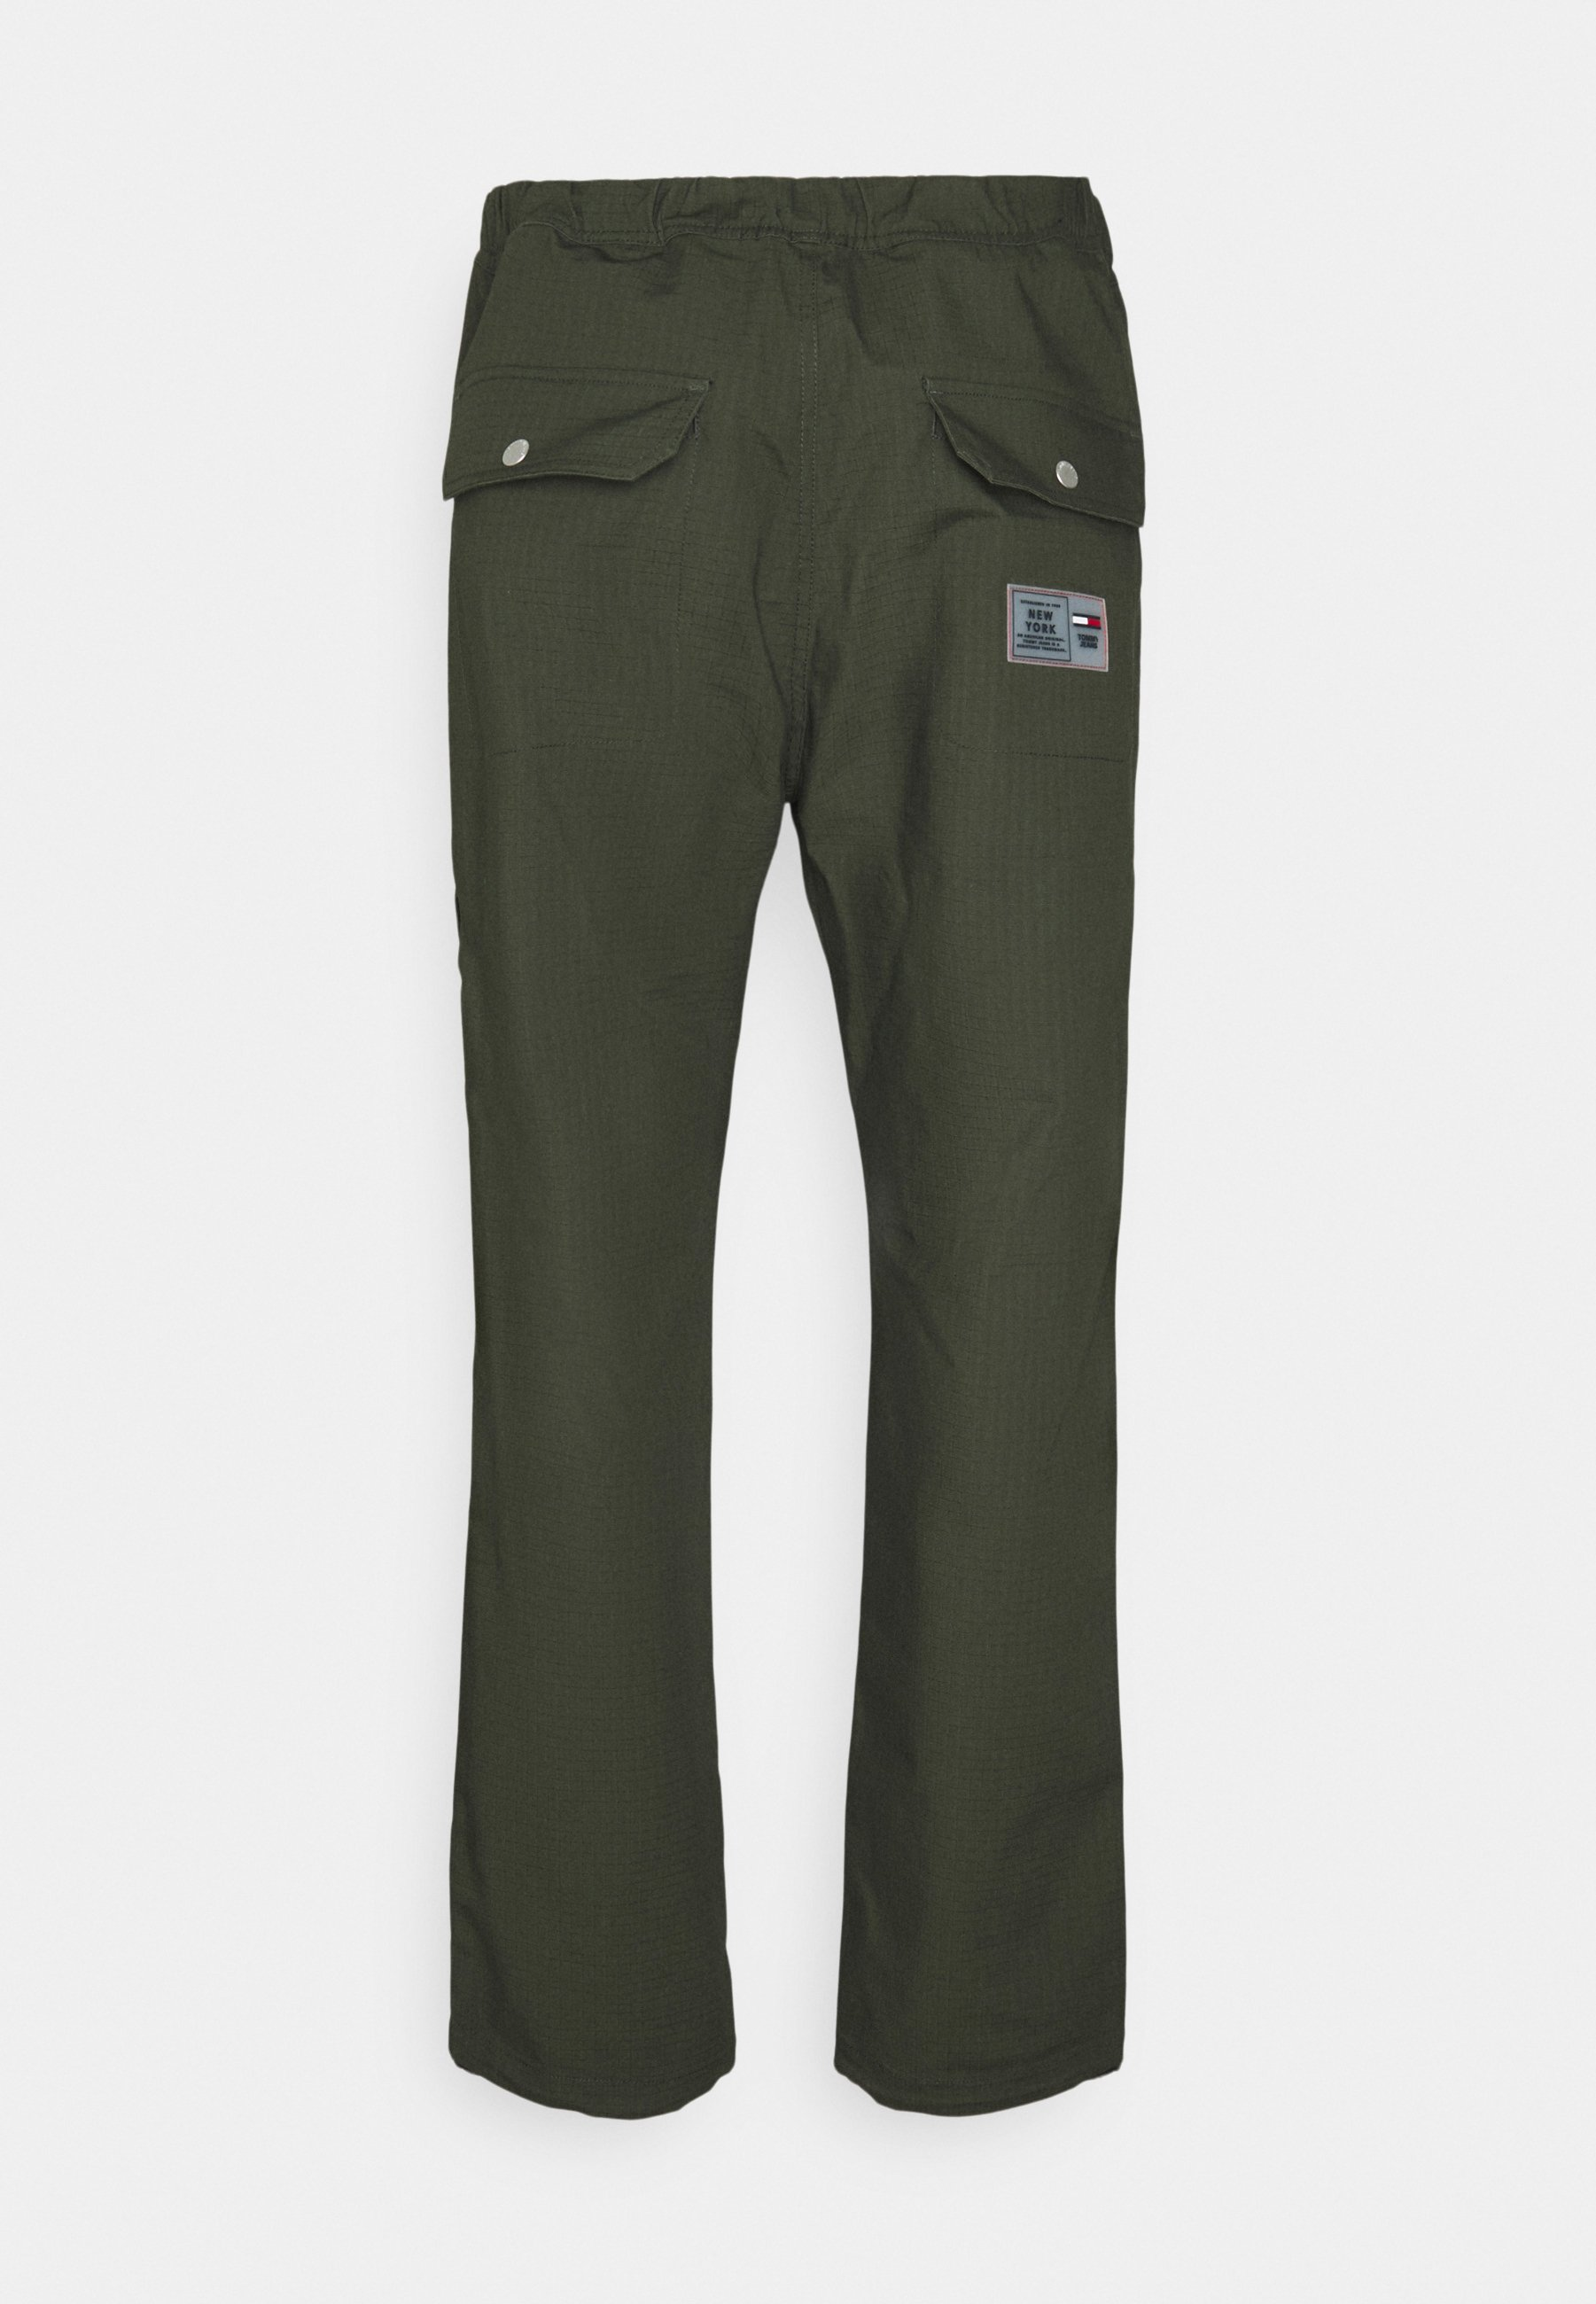 Homme ETHAN MULTIPOCKET TRACK PANT - Pantalon cargo